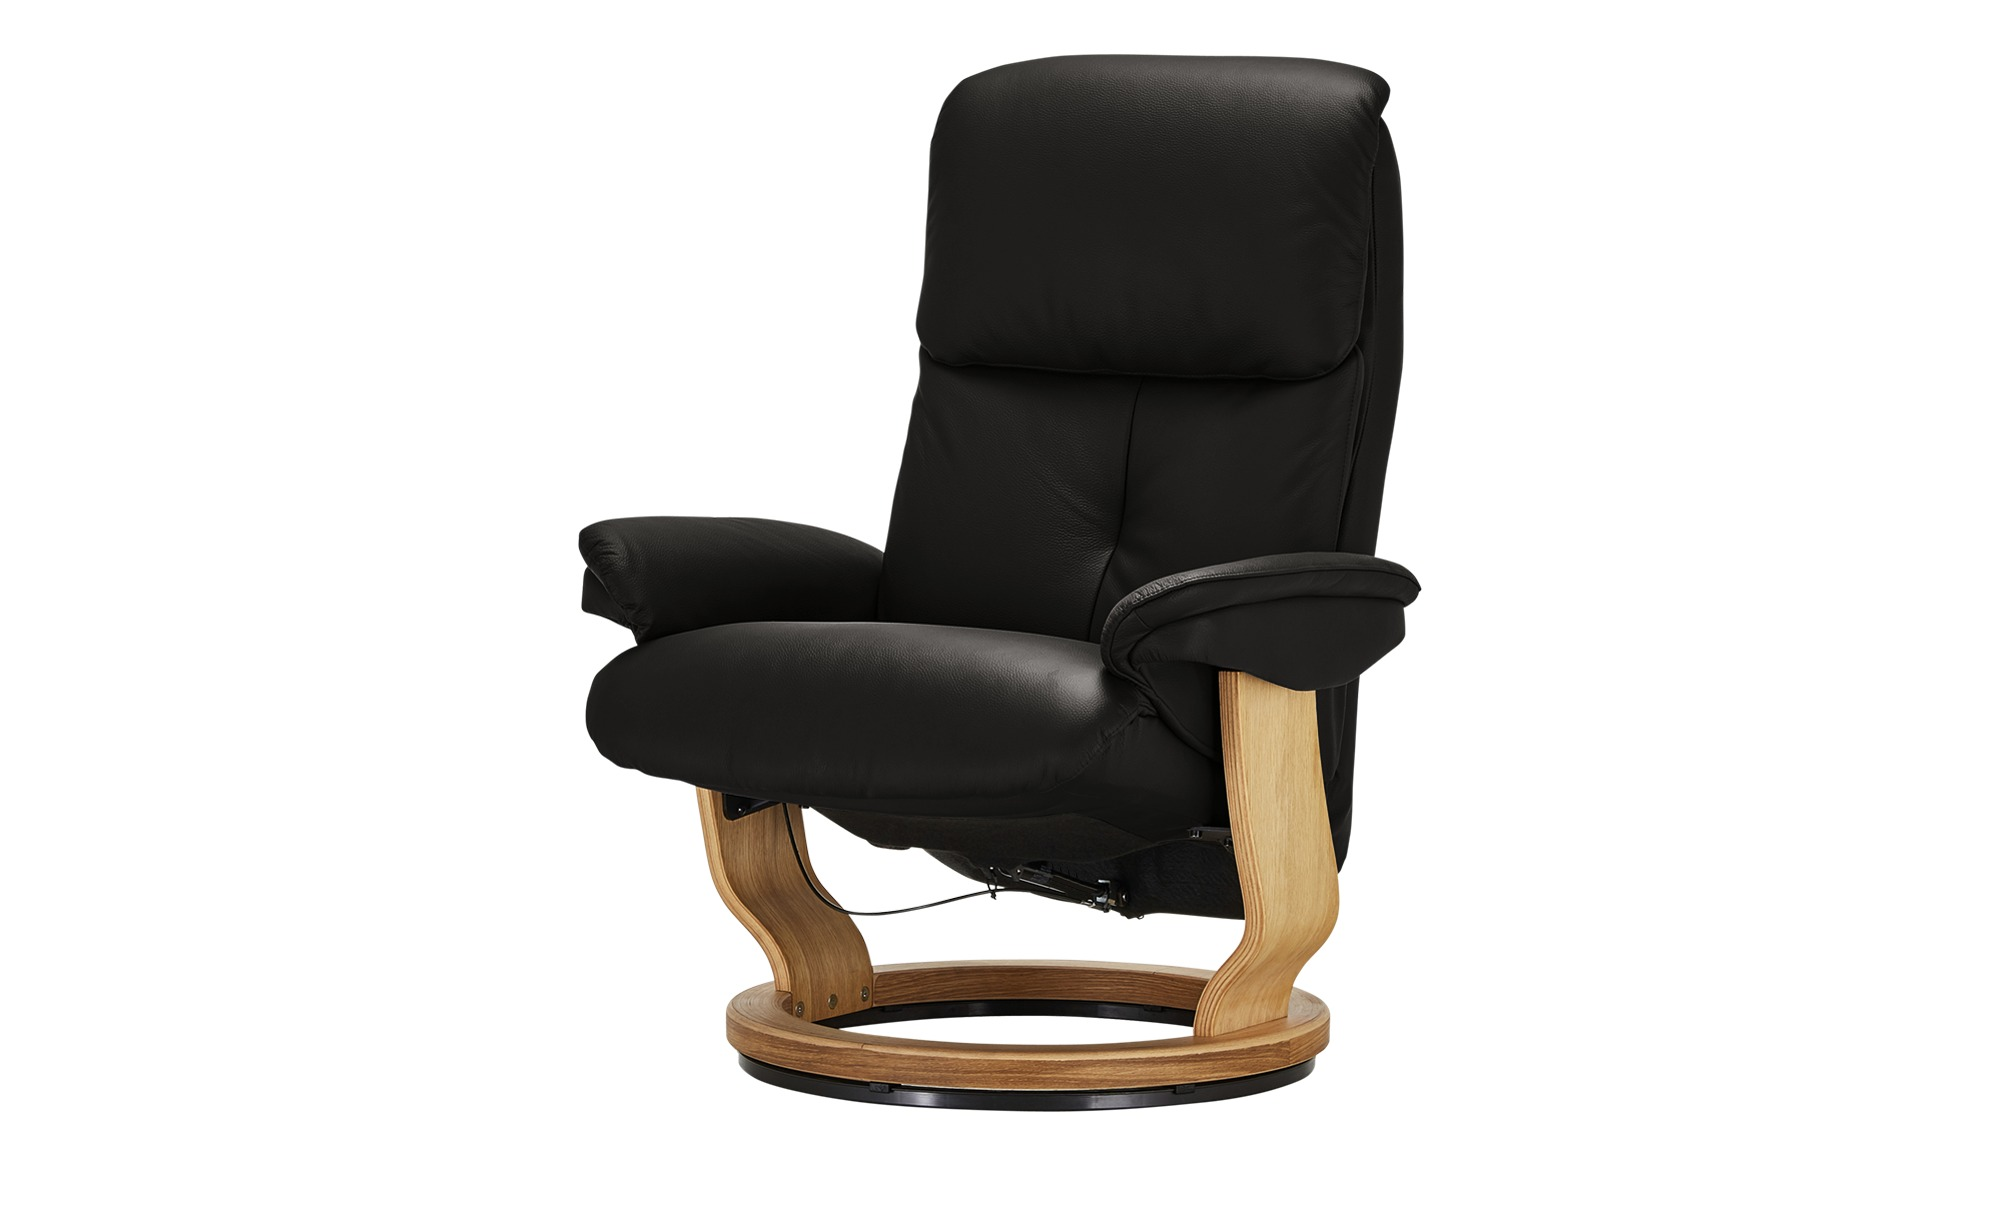 Relaxsessel  Farso ¦ braun ¦ Maße (cm): B: 85 H: 114 T: 92 Polstermöbel > Sessel > Ledersessel - Höffner